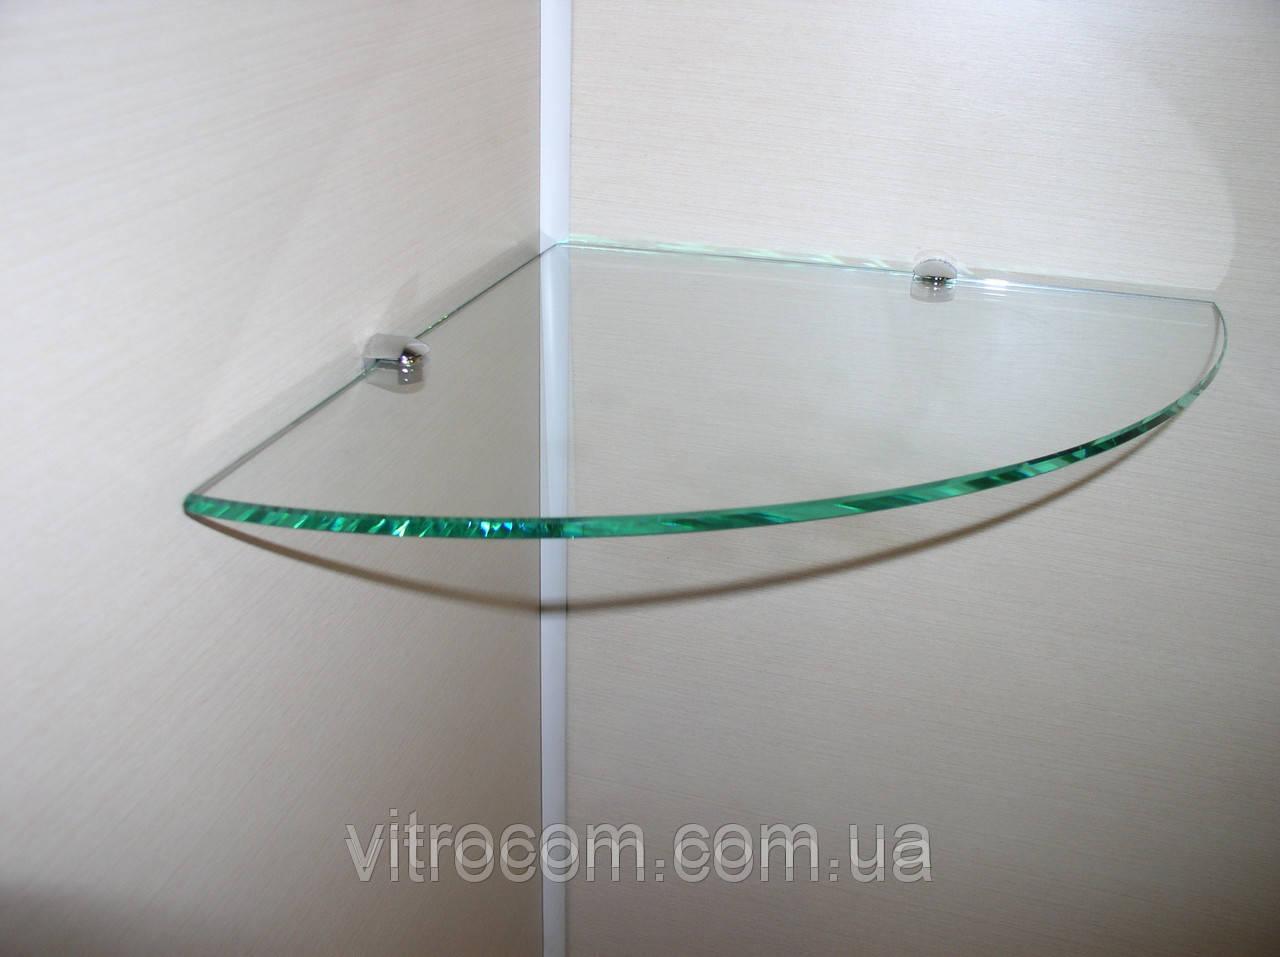 Полка стеклянная угловая 4 мм прозрачная 30 х 30 см